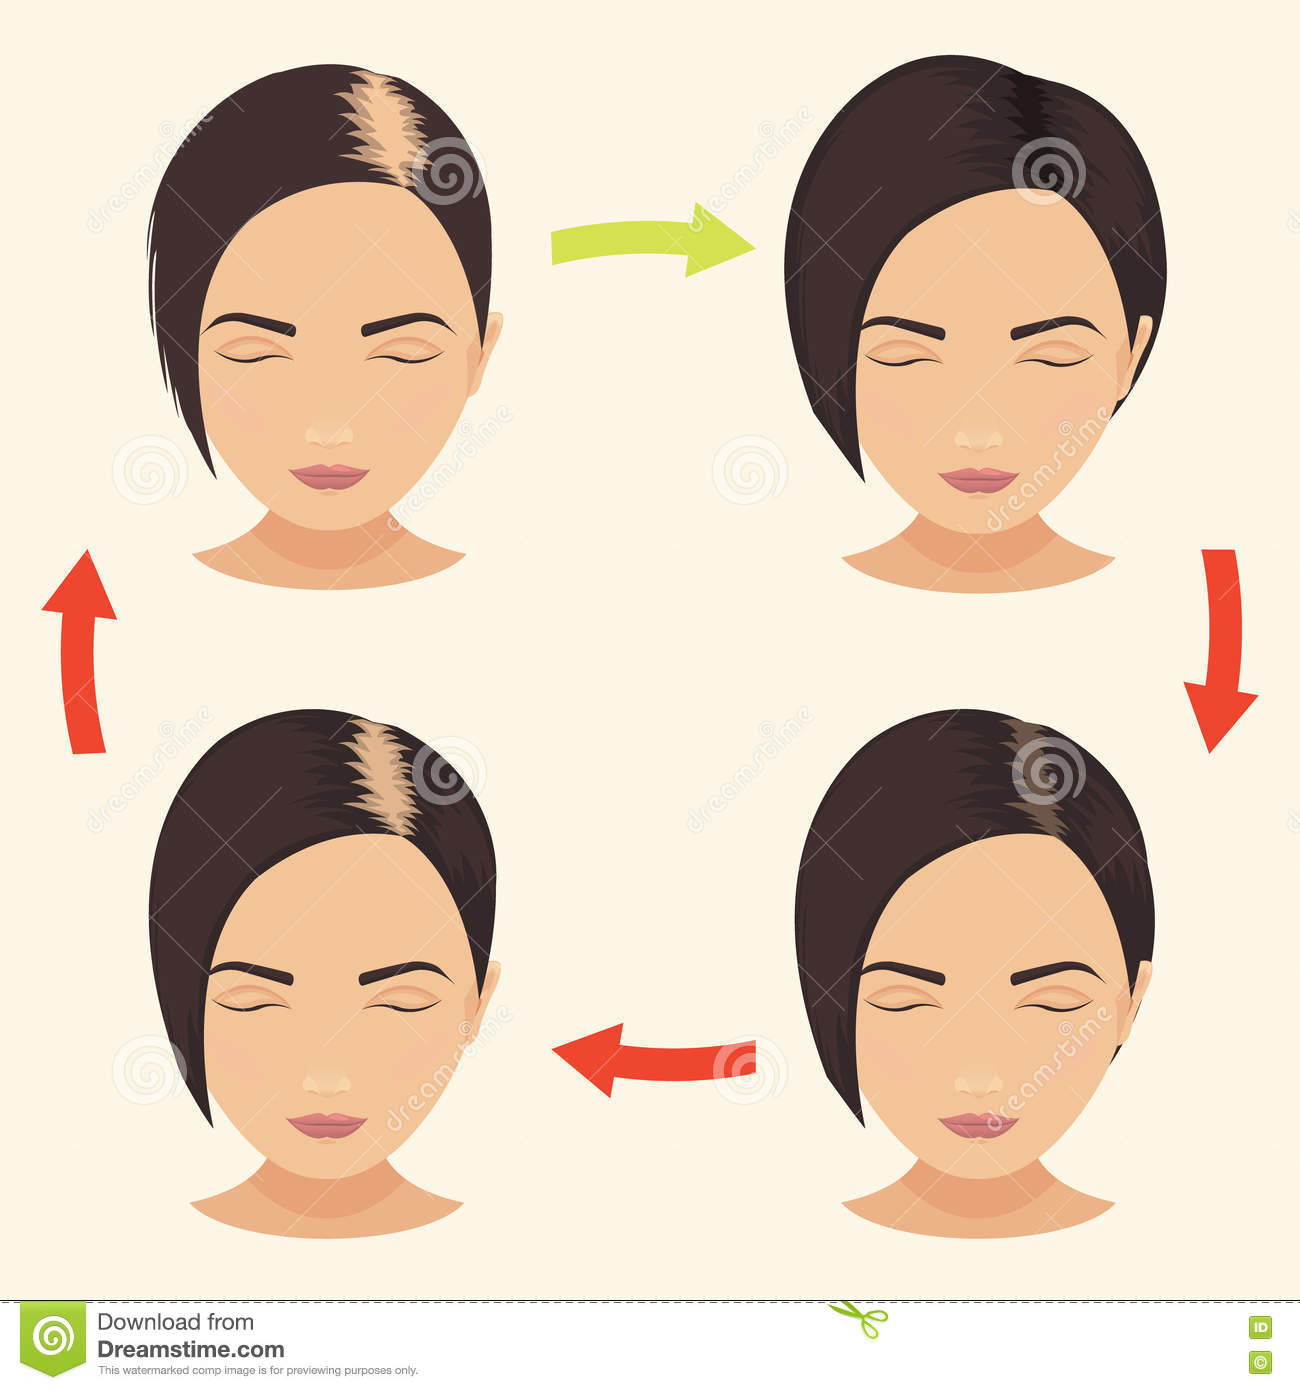 Alopecia clipart #15